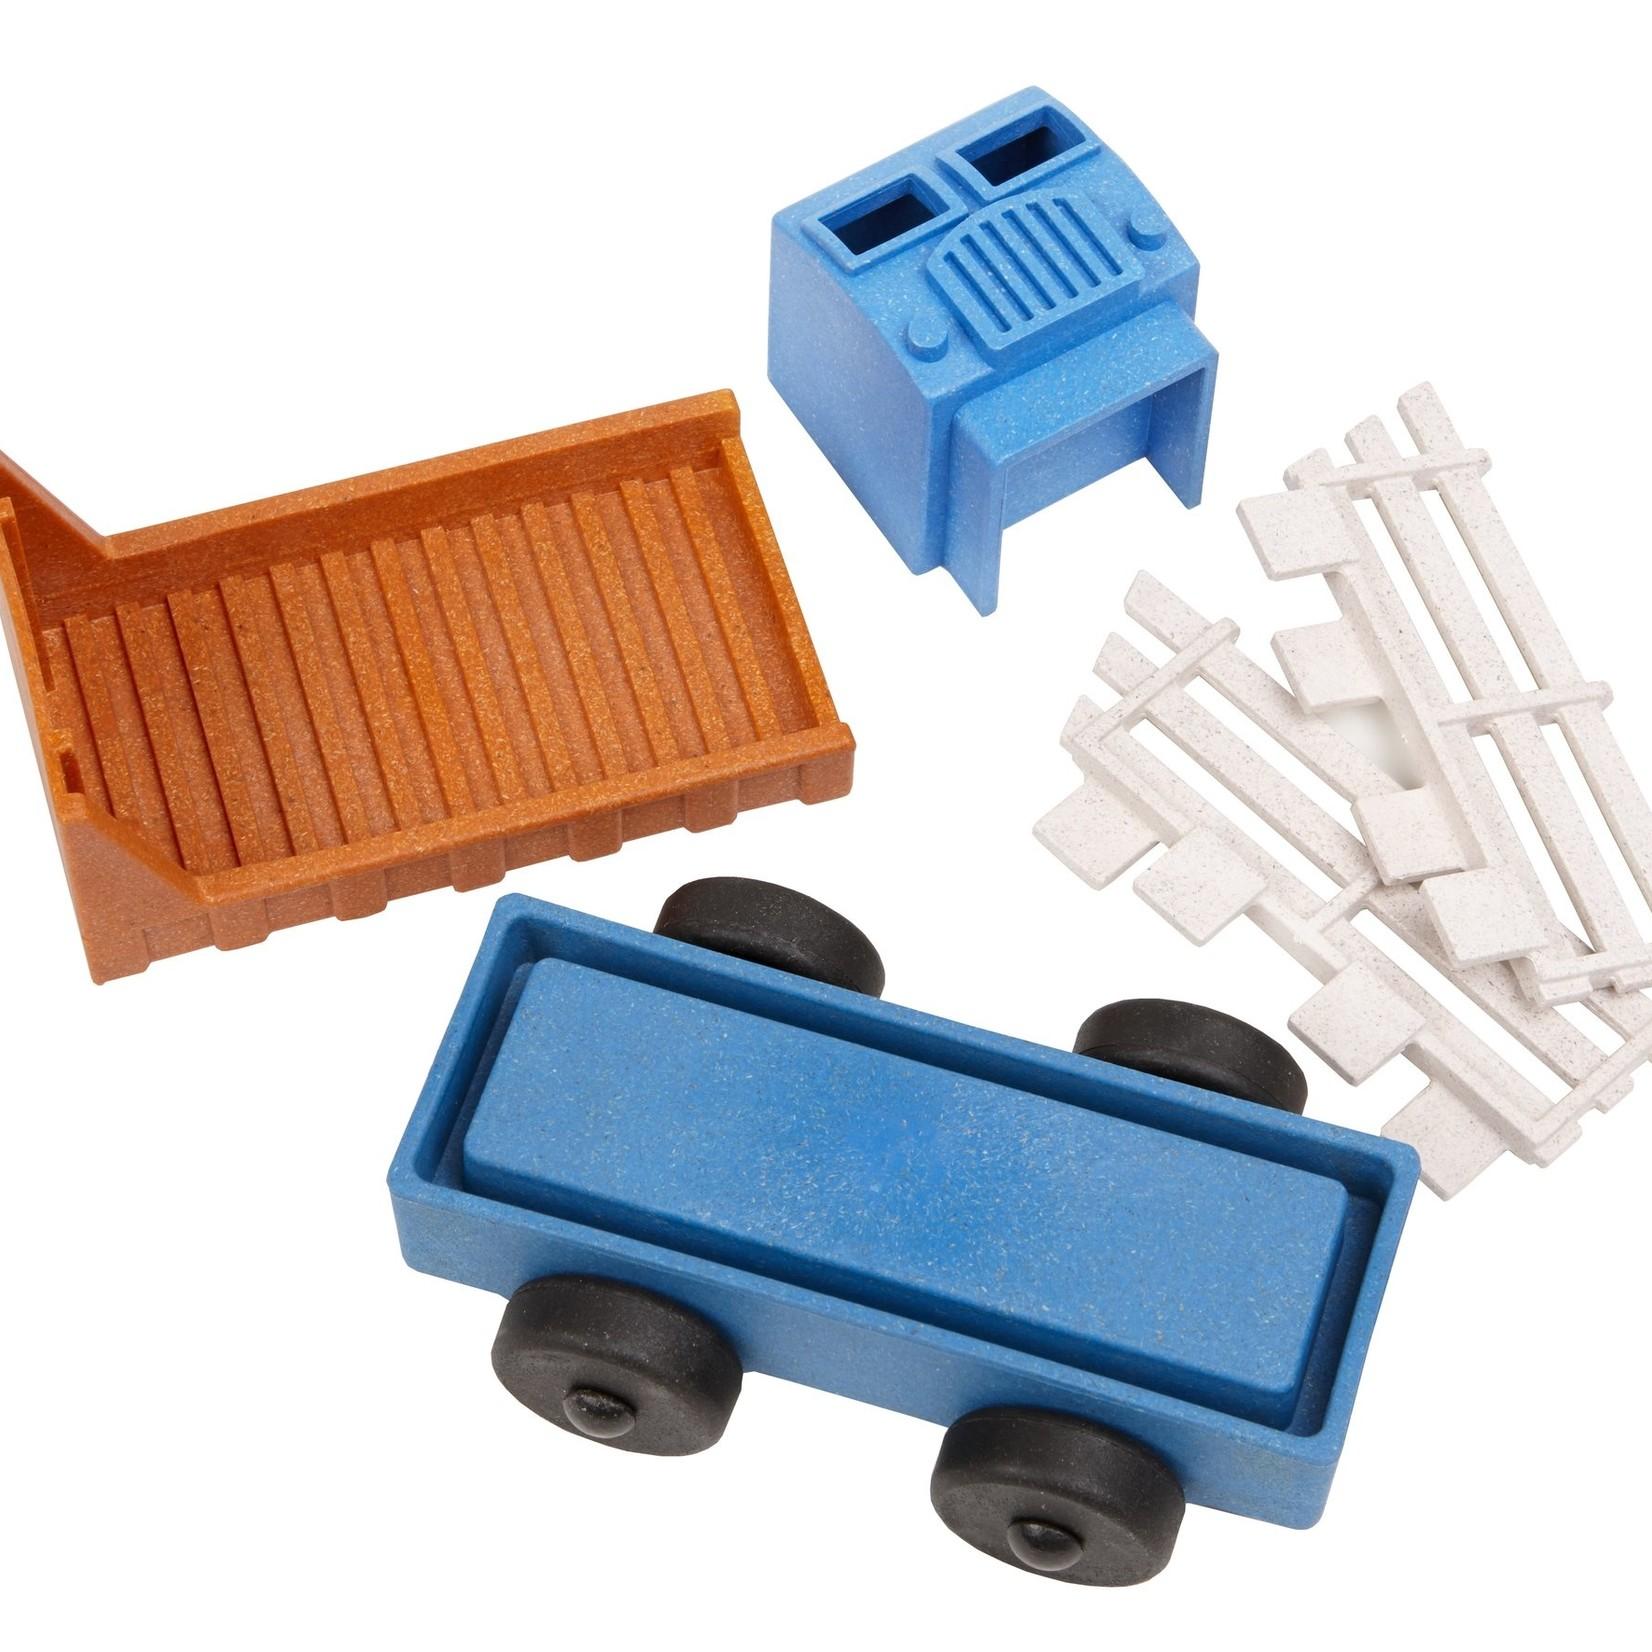 Luke's Toy Factory Stake Truck